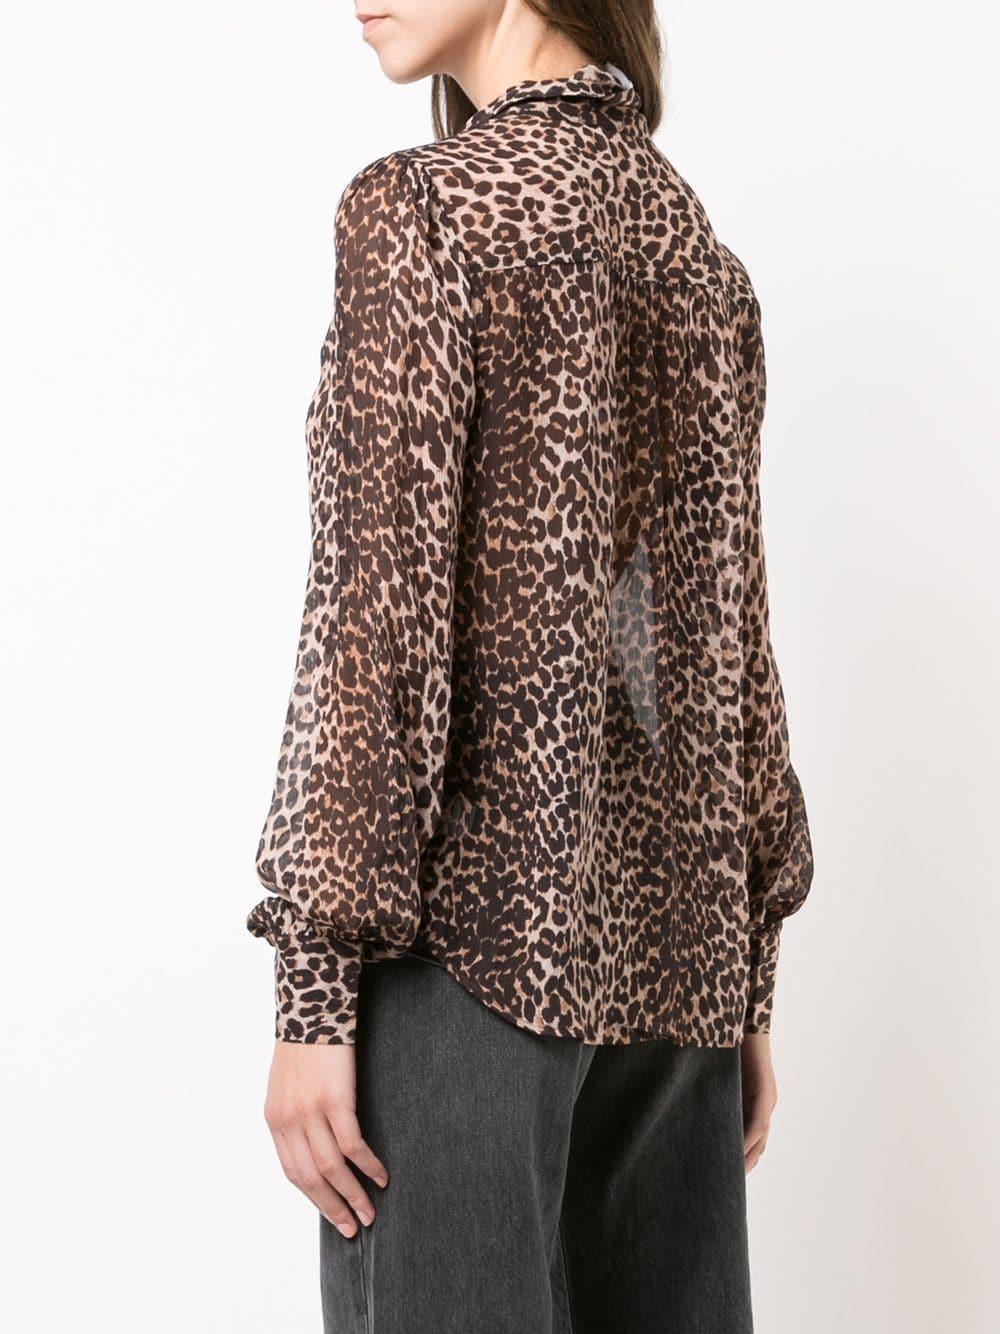 ec5517a2ffaa30 Paige Denim - Cleobella Brown & Tan Silk Leopard Printed Blouse ...